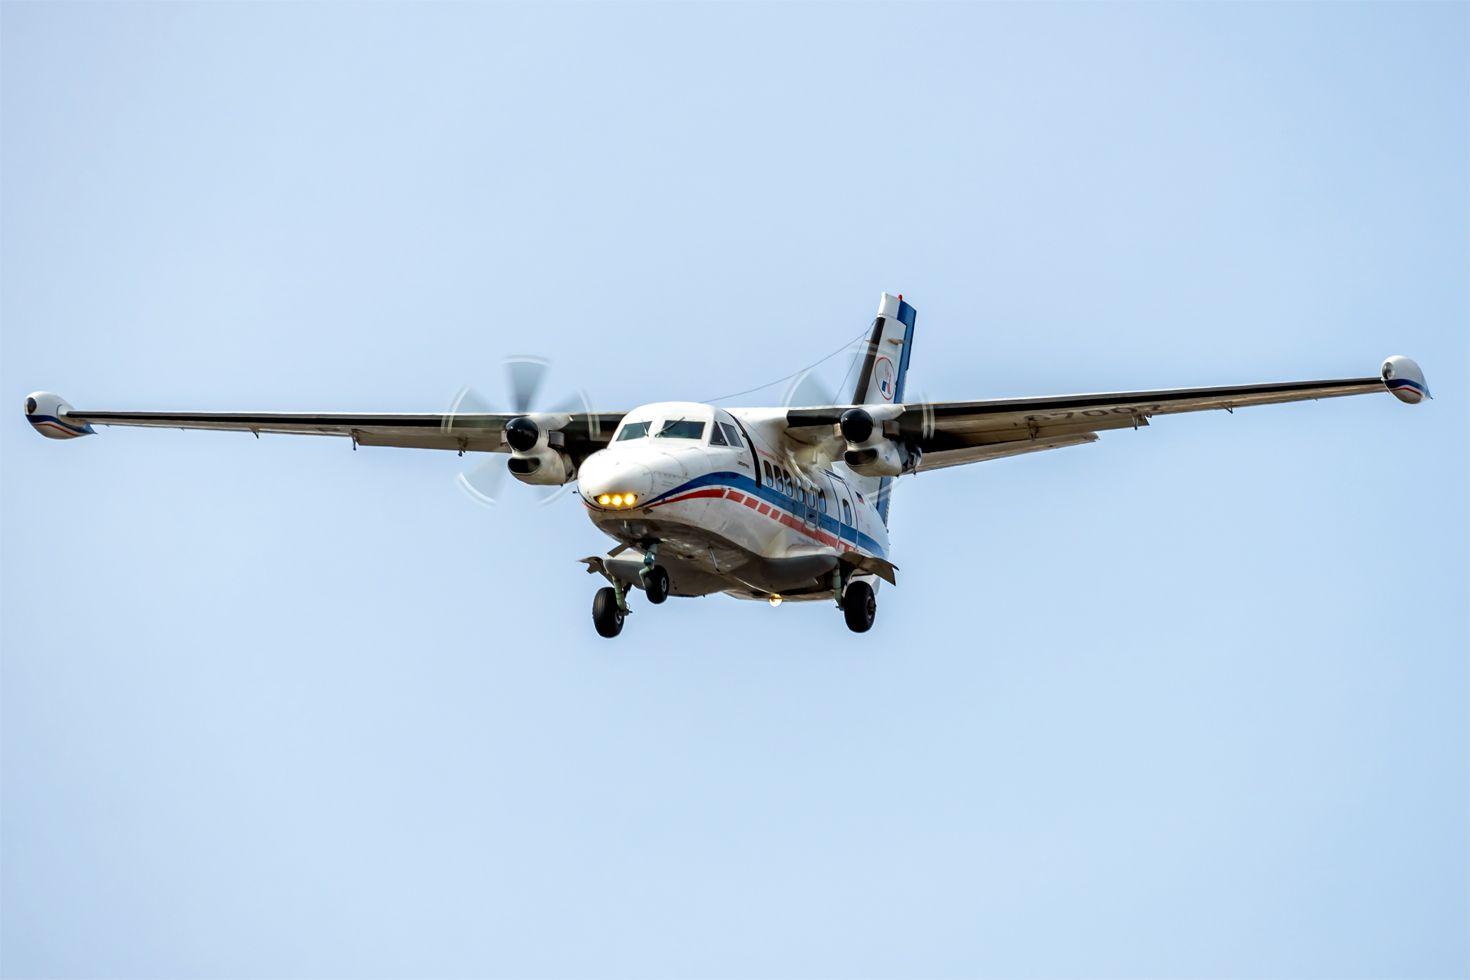 RA-67007 споттинг Russia Siberia Irkutsk Россия Сибирь Иркутск spotting airline aircraft airplane